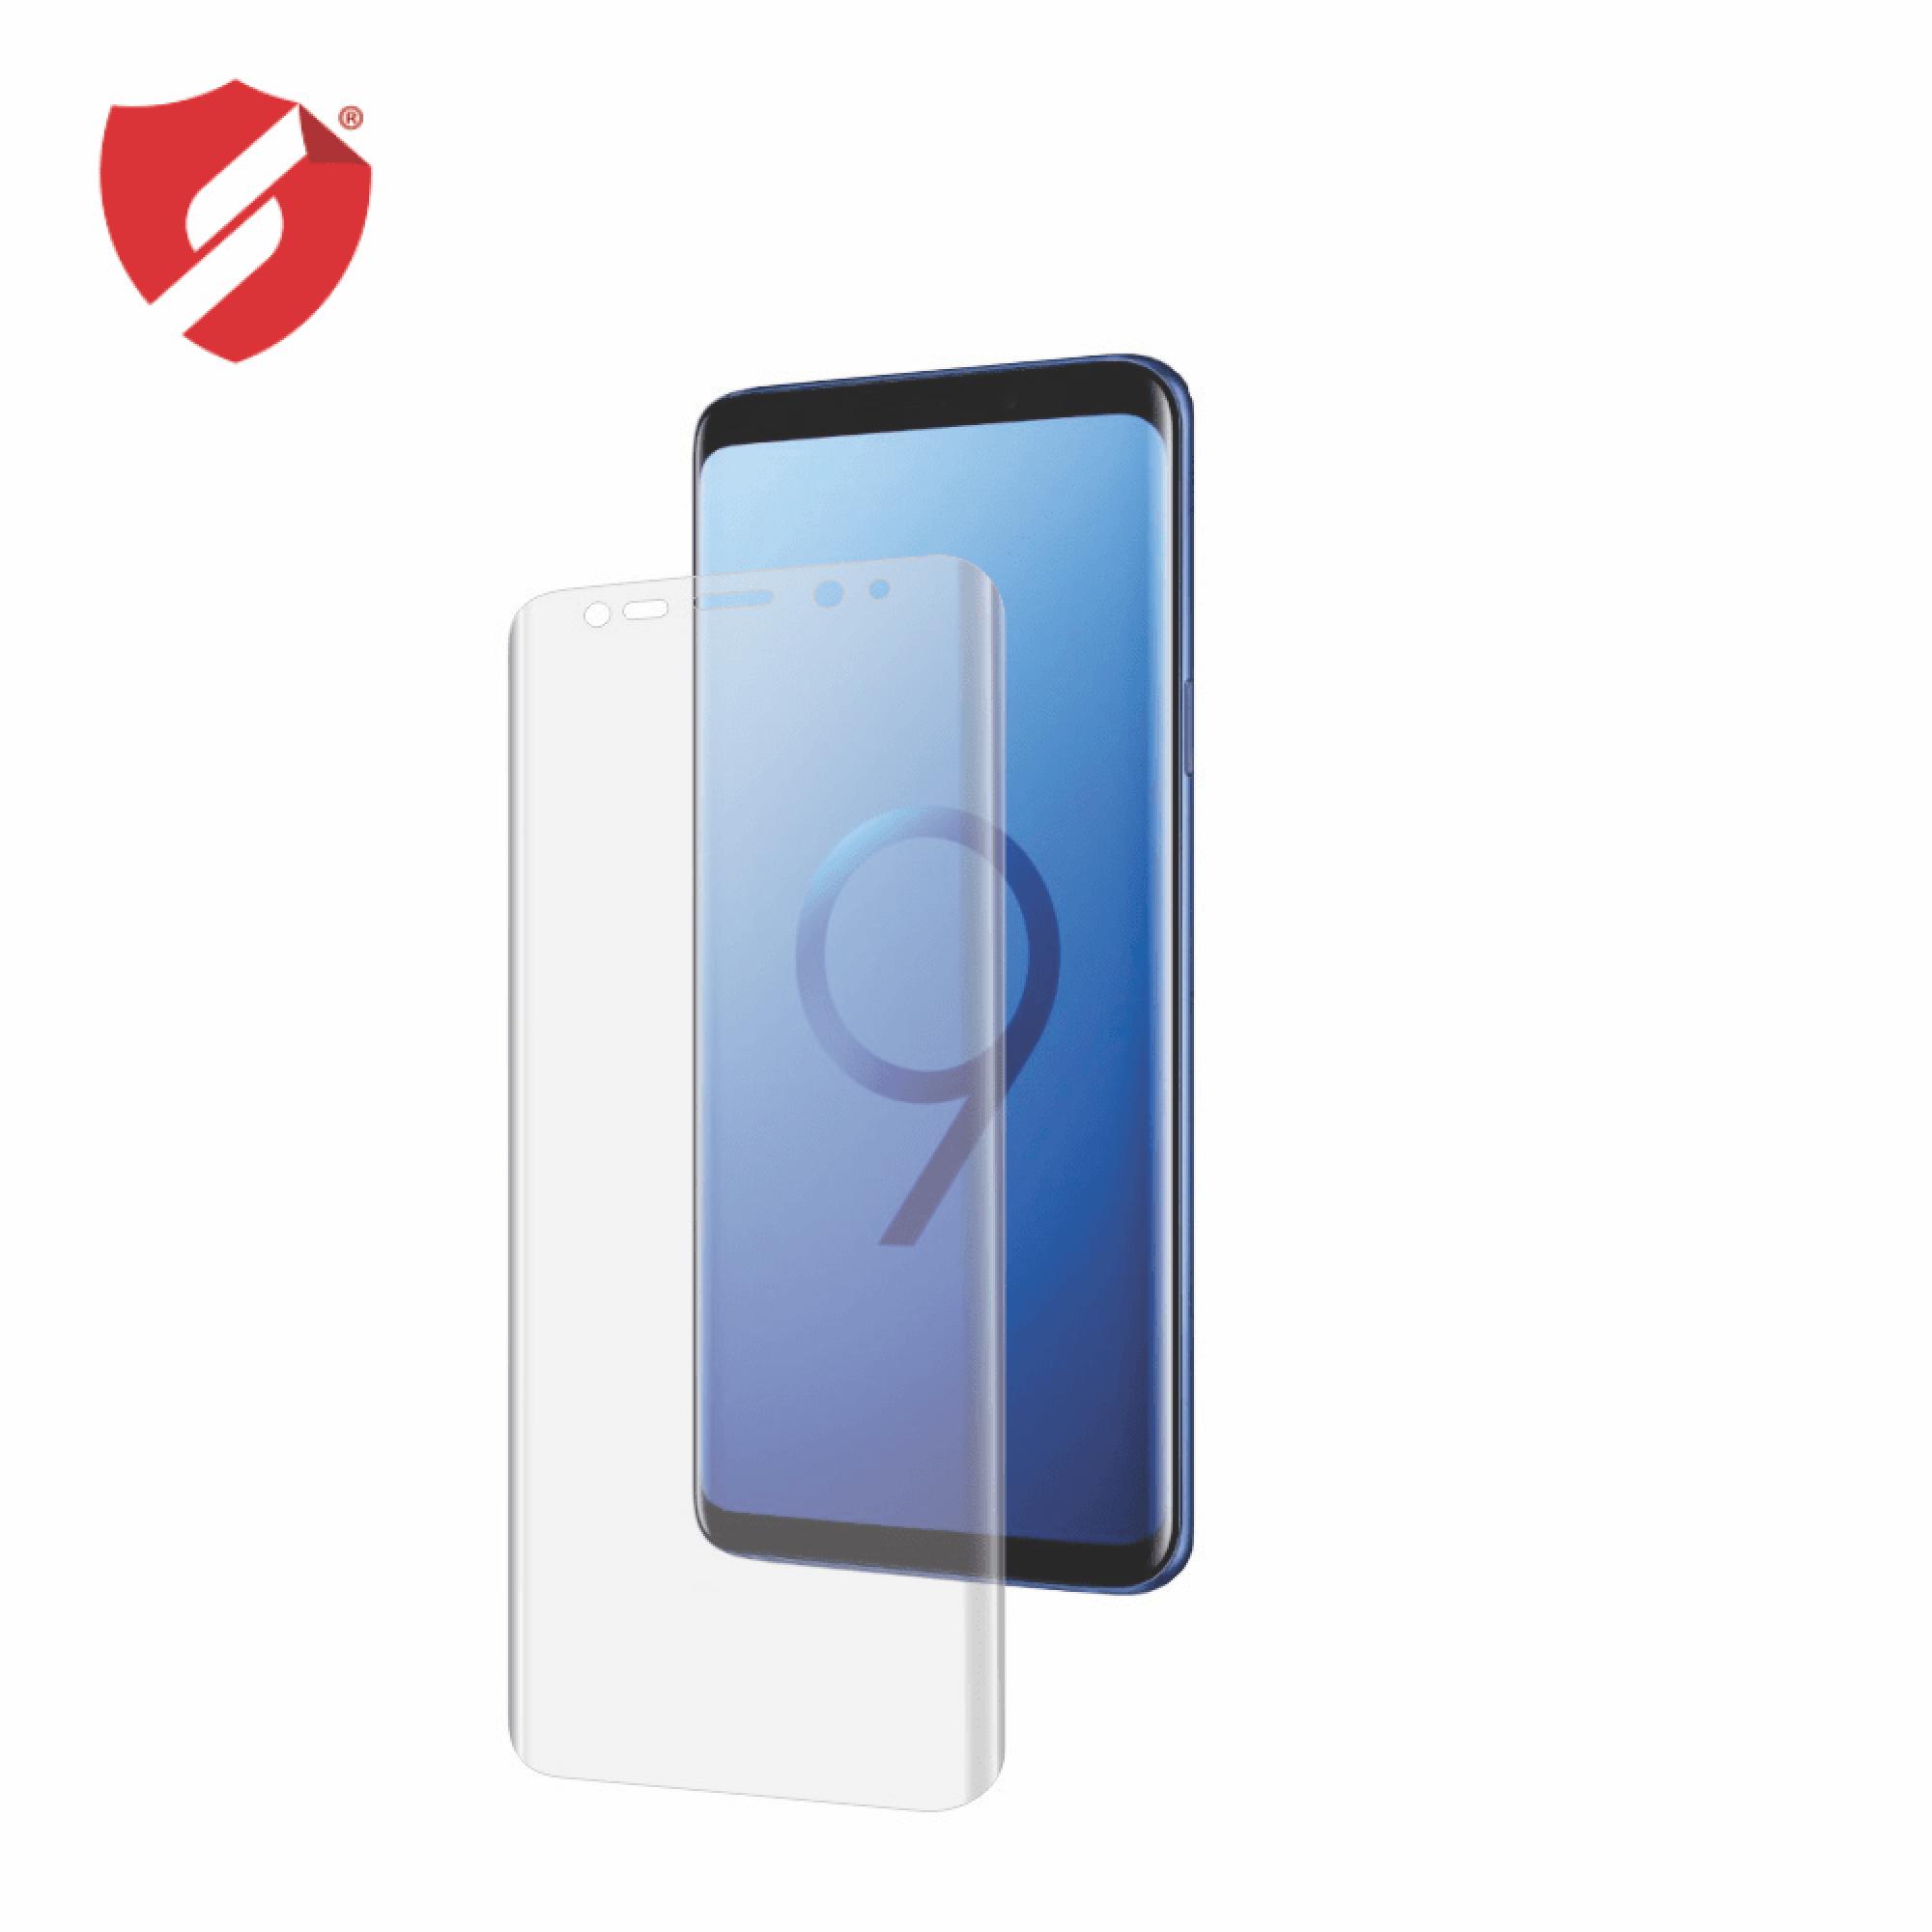 Folie de protectie Smart Protection Samsung Galaxy S9 Plus compatibila cu carcasa Spigen - doar-display imagine